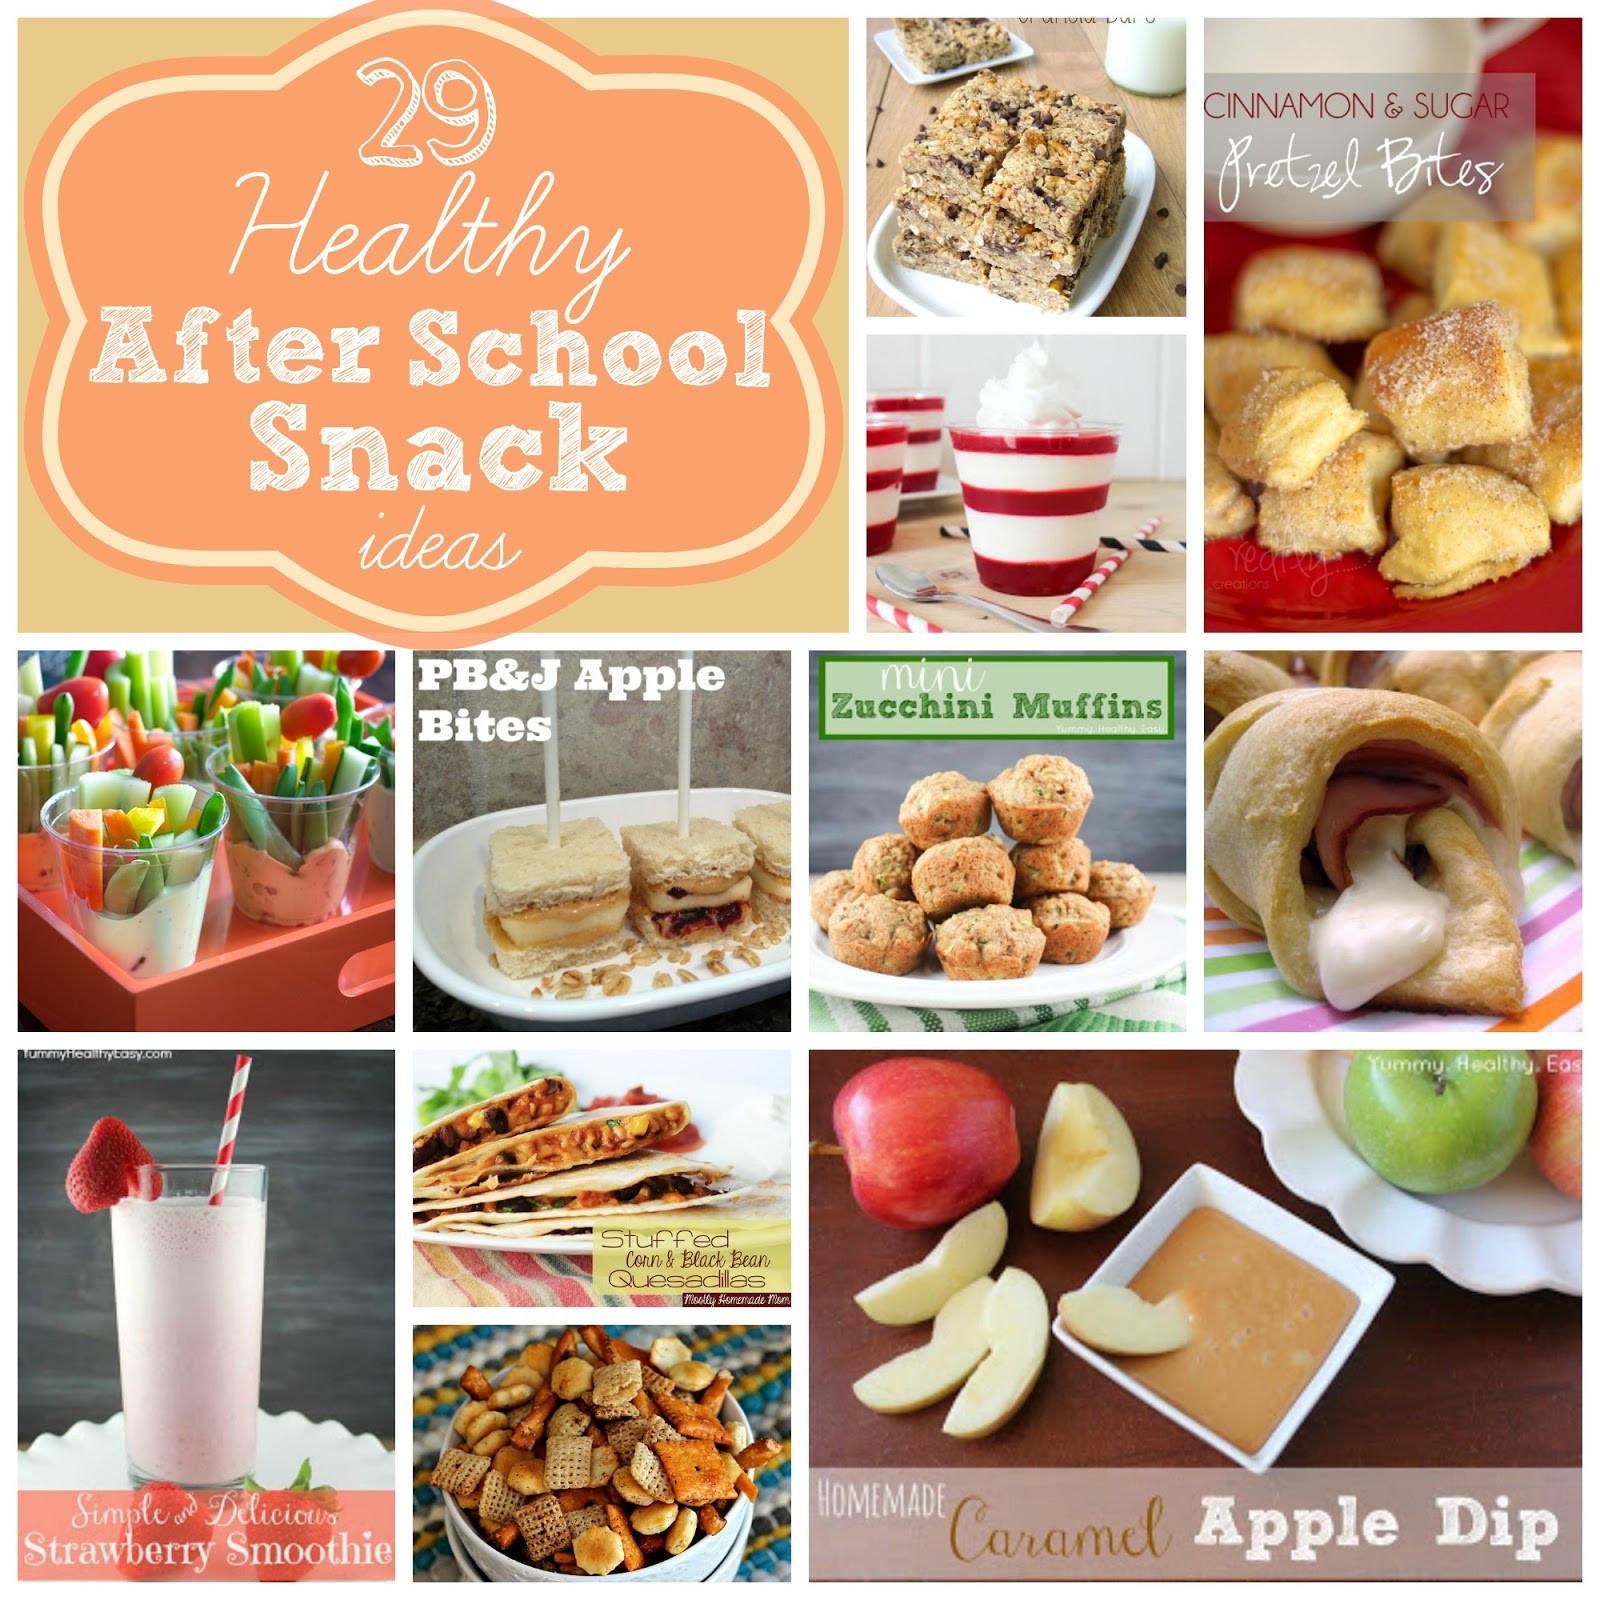 Easy Healthy Afterschool Snacks  29 Healthy After School Snack Ideas Yummy Healthy Easy